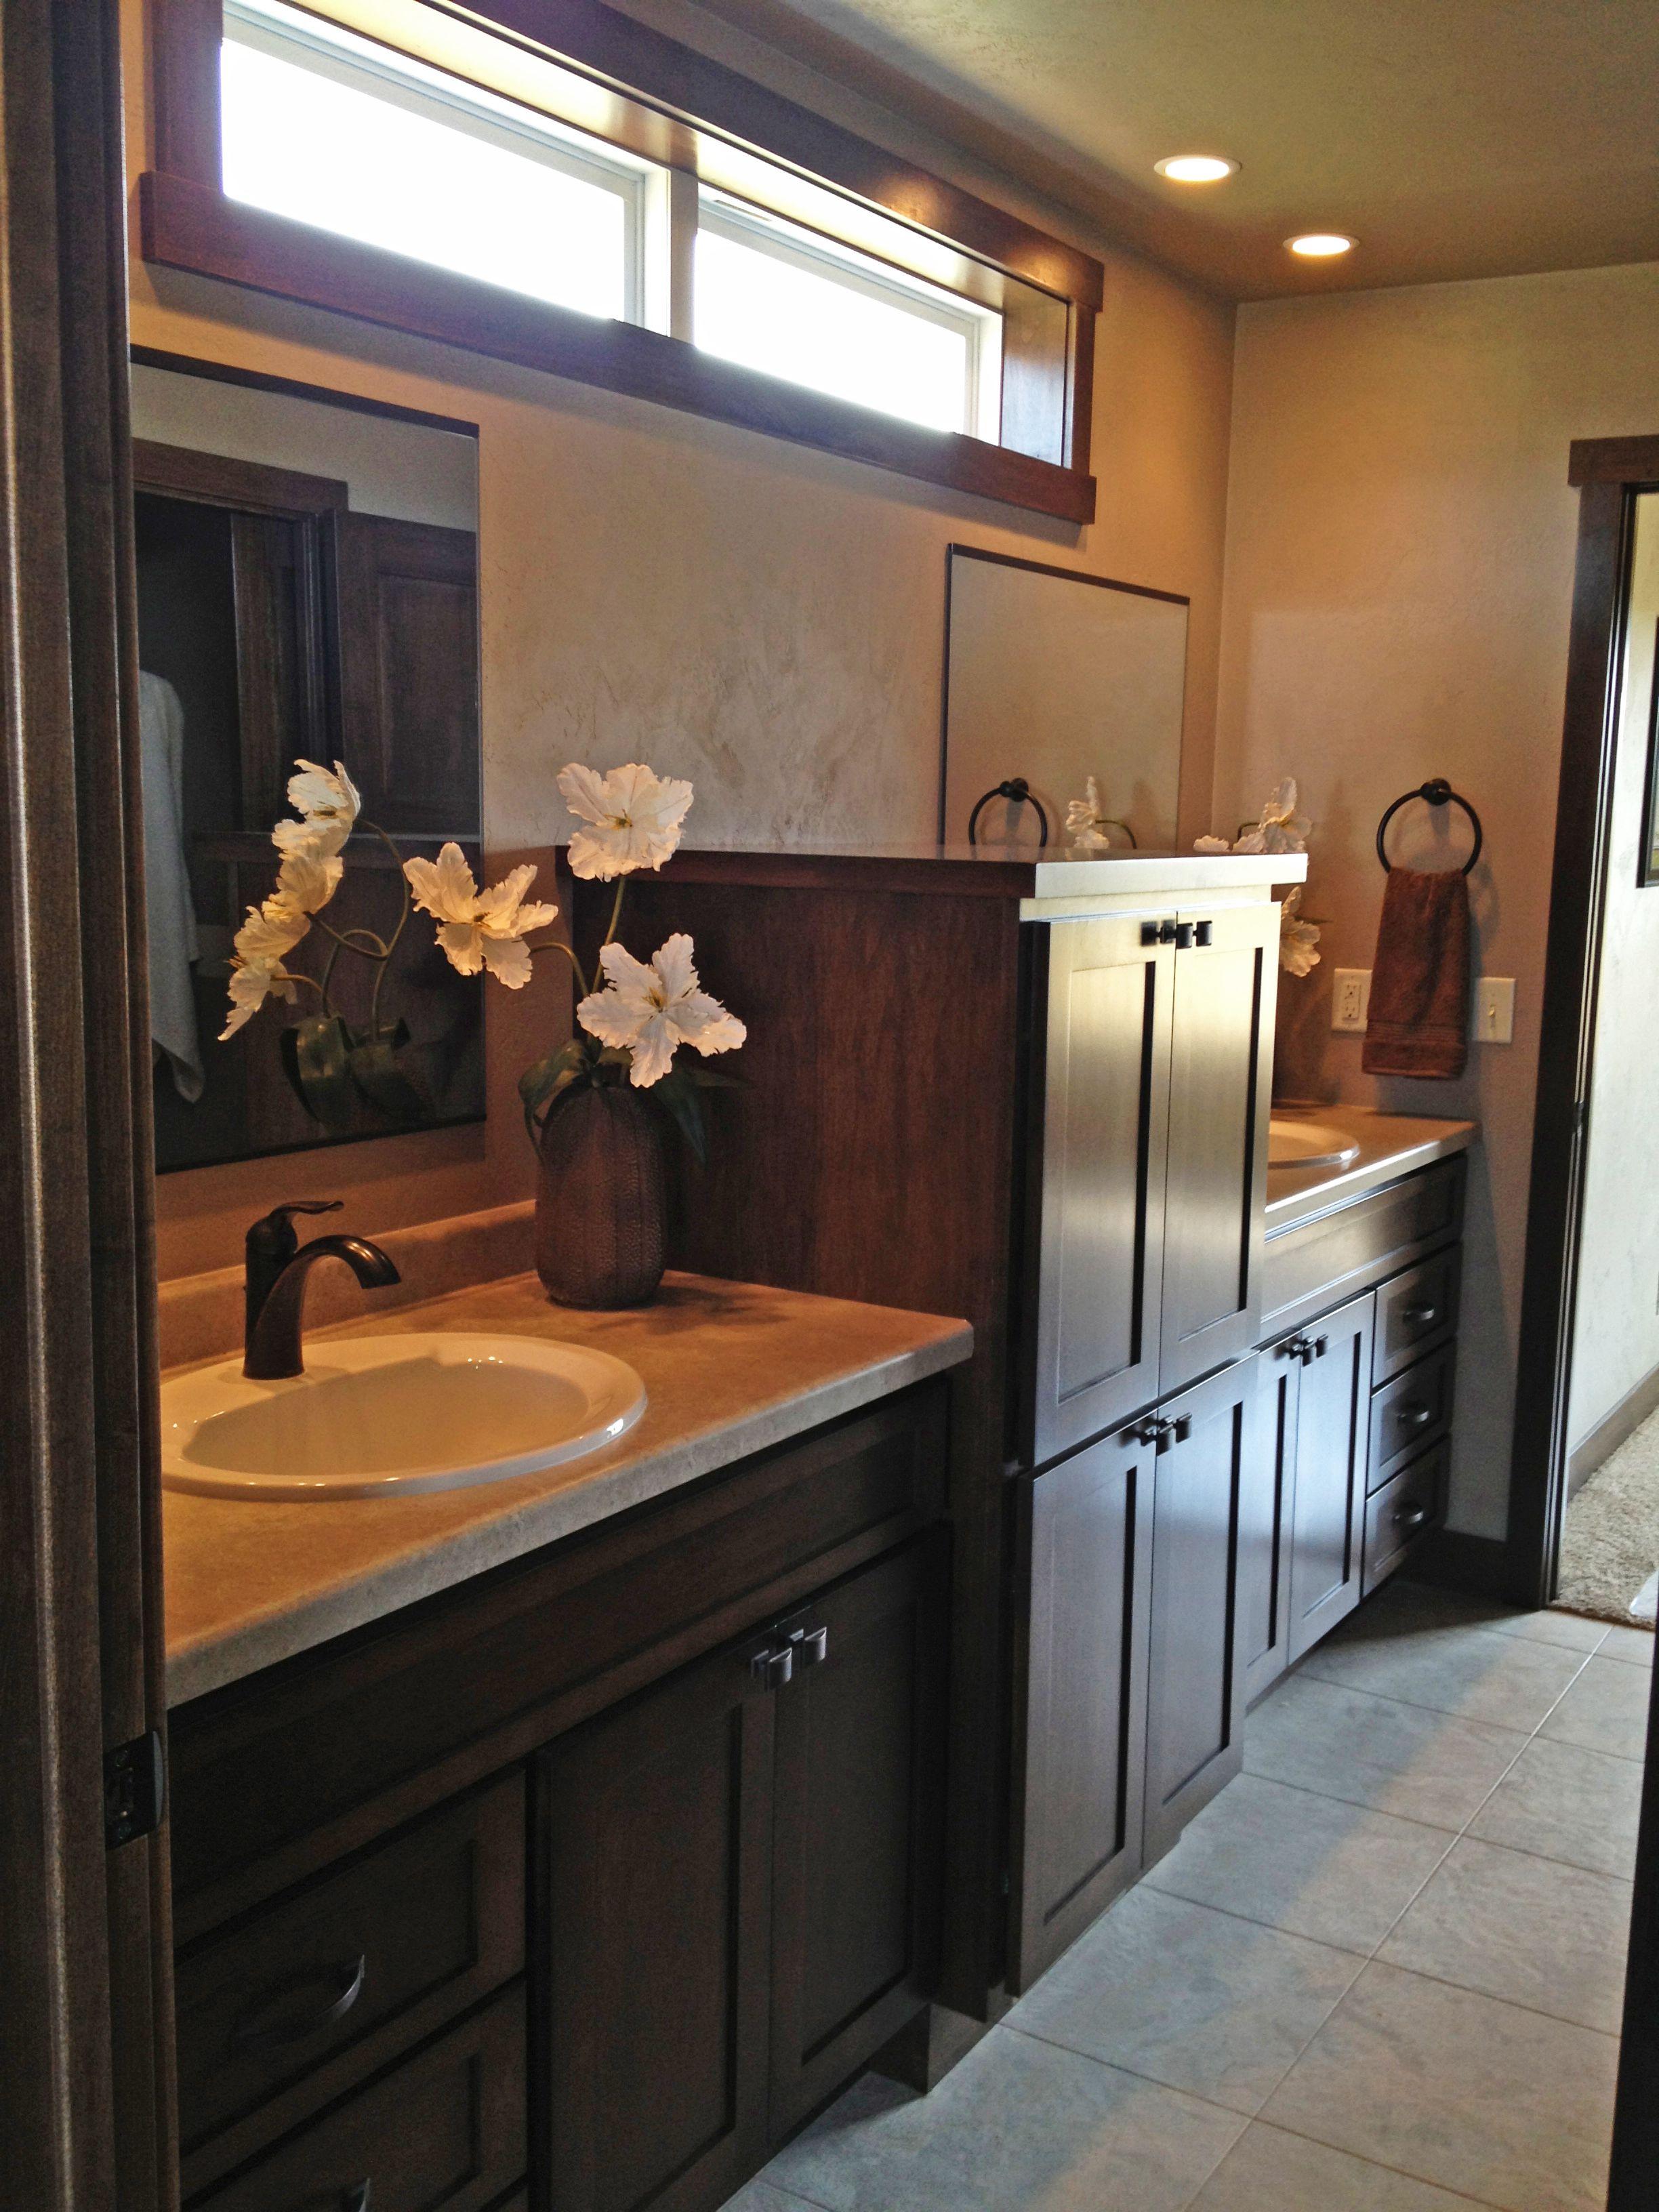 Double Vanity Master Bathroom Off Of The Master Bedroom Master Bathroom Framed Bathroom Mirror Double Vanity